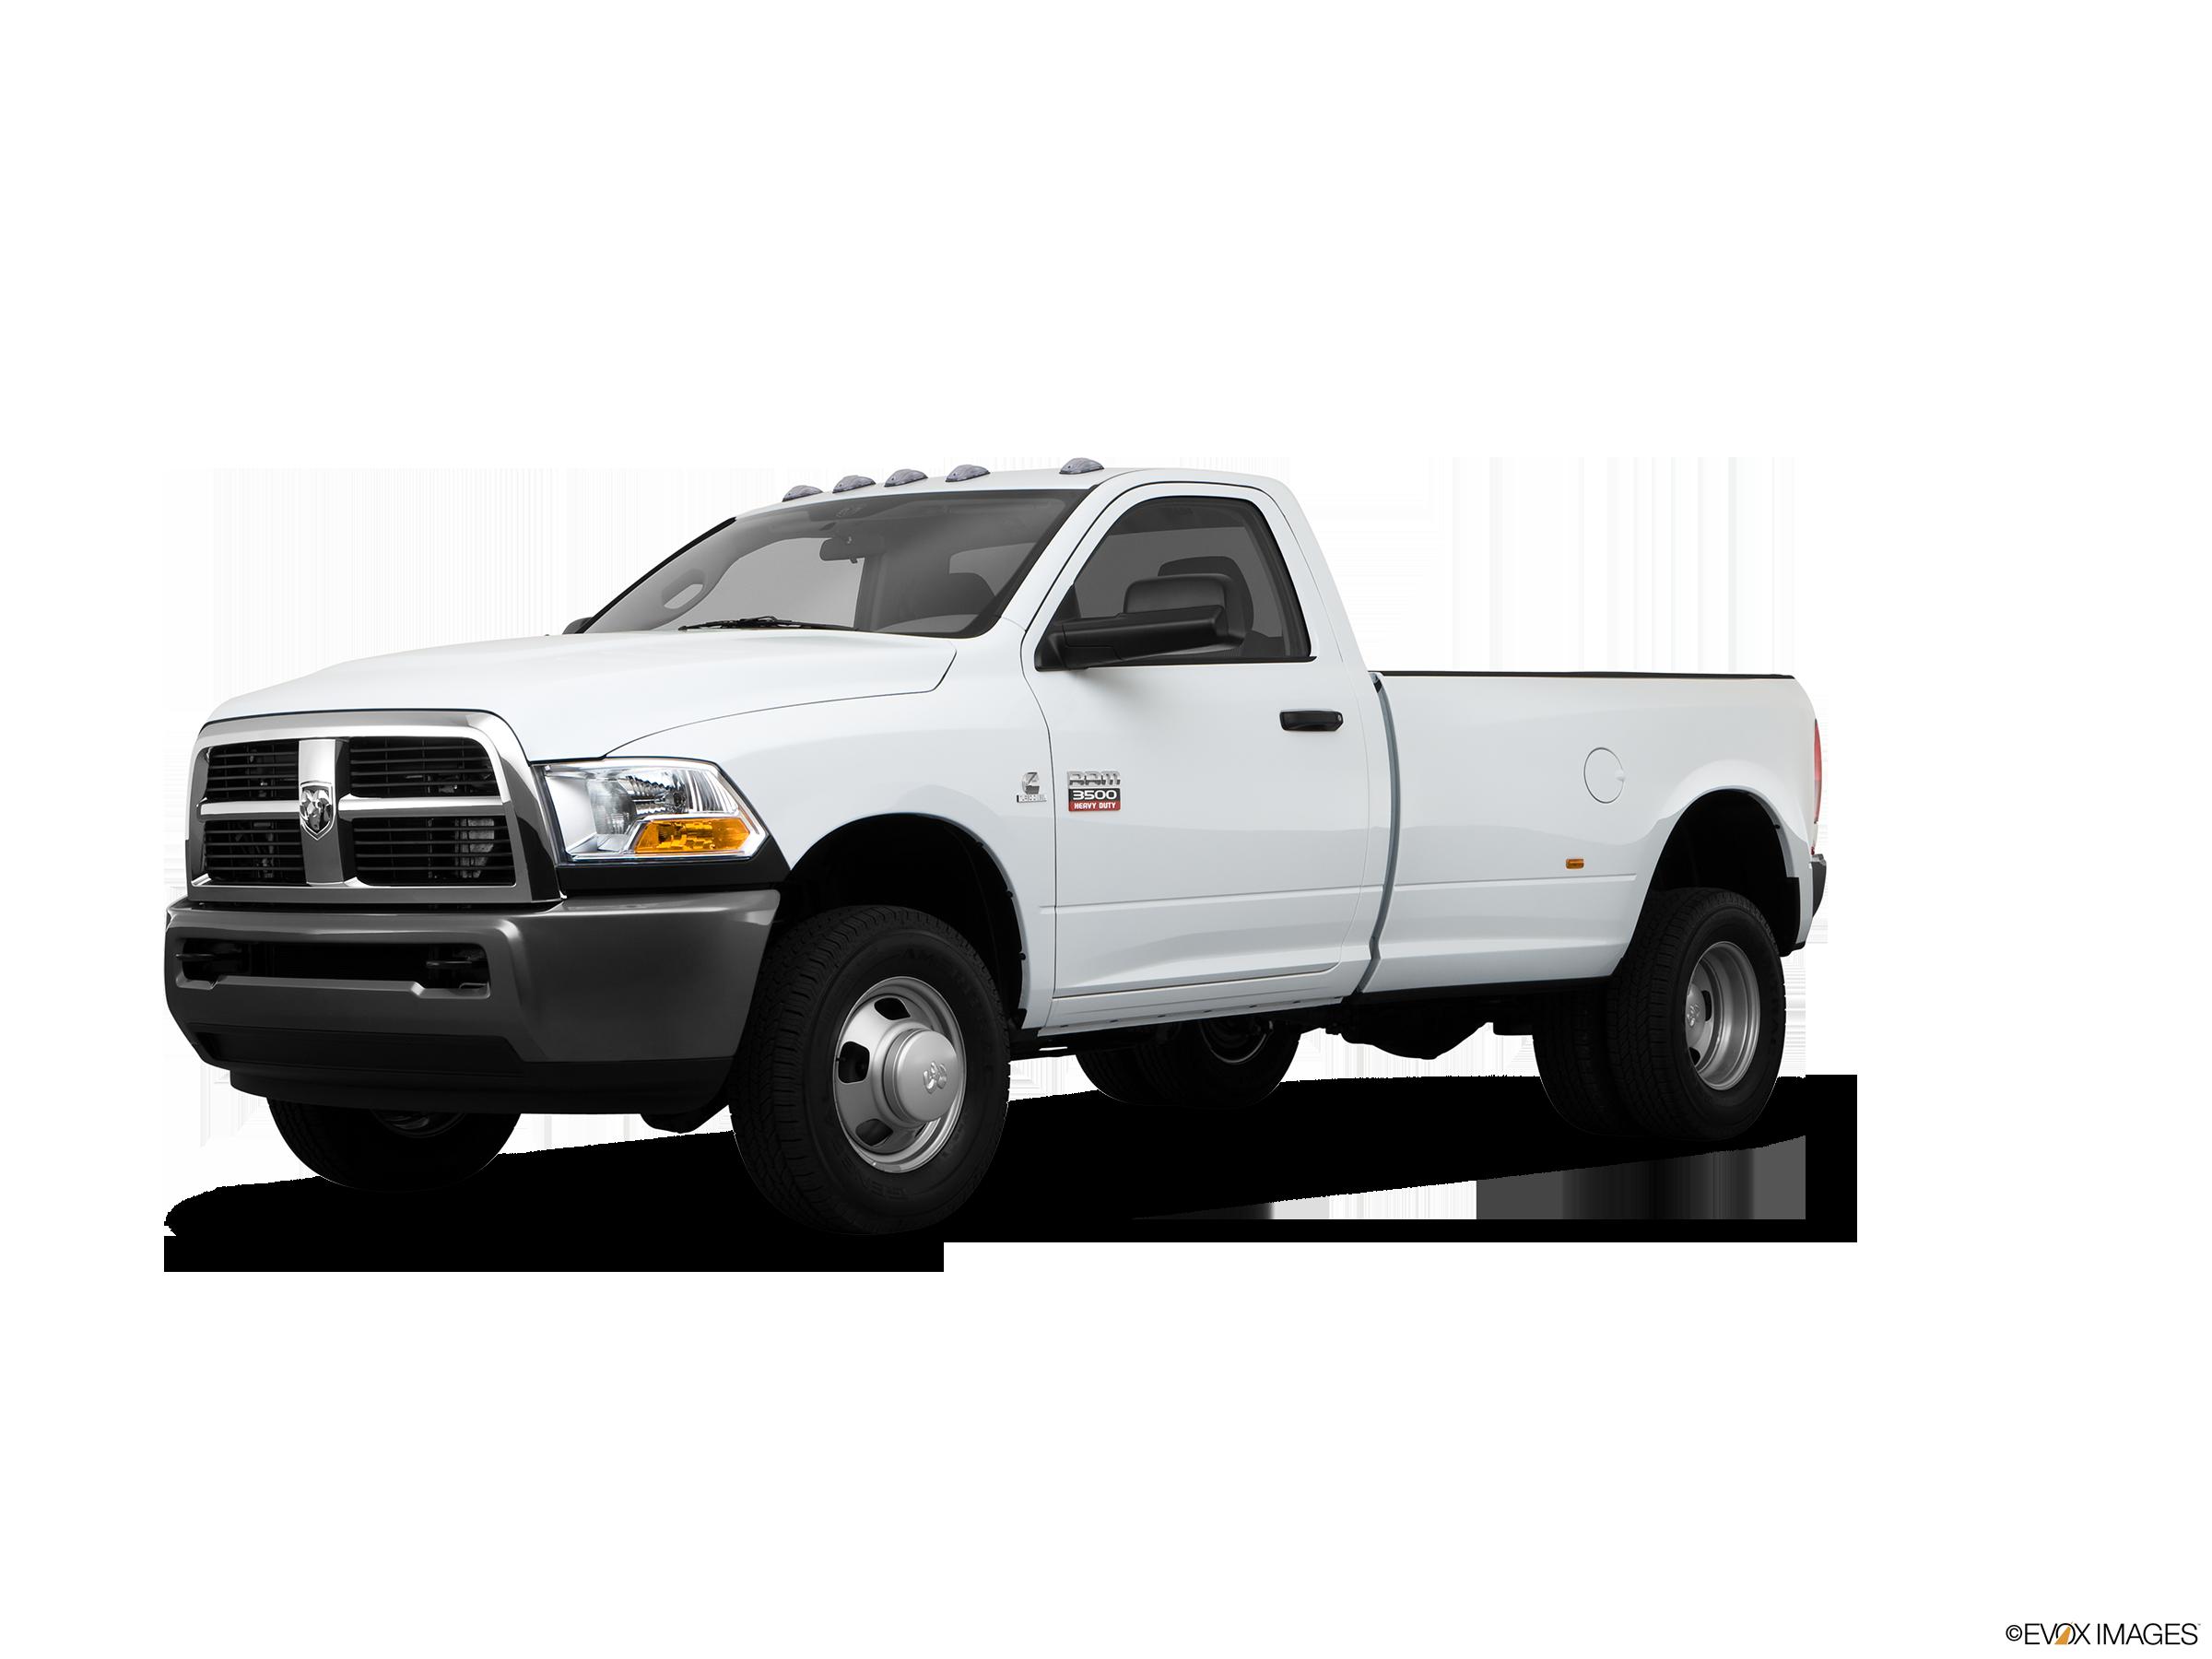 2010 Dodge Ram 3500 Values Cars For Sale Kelley Blue Book